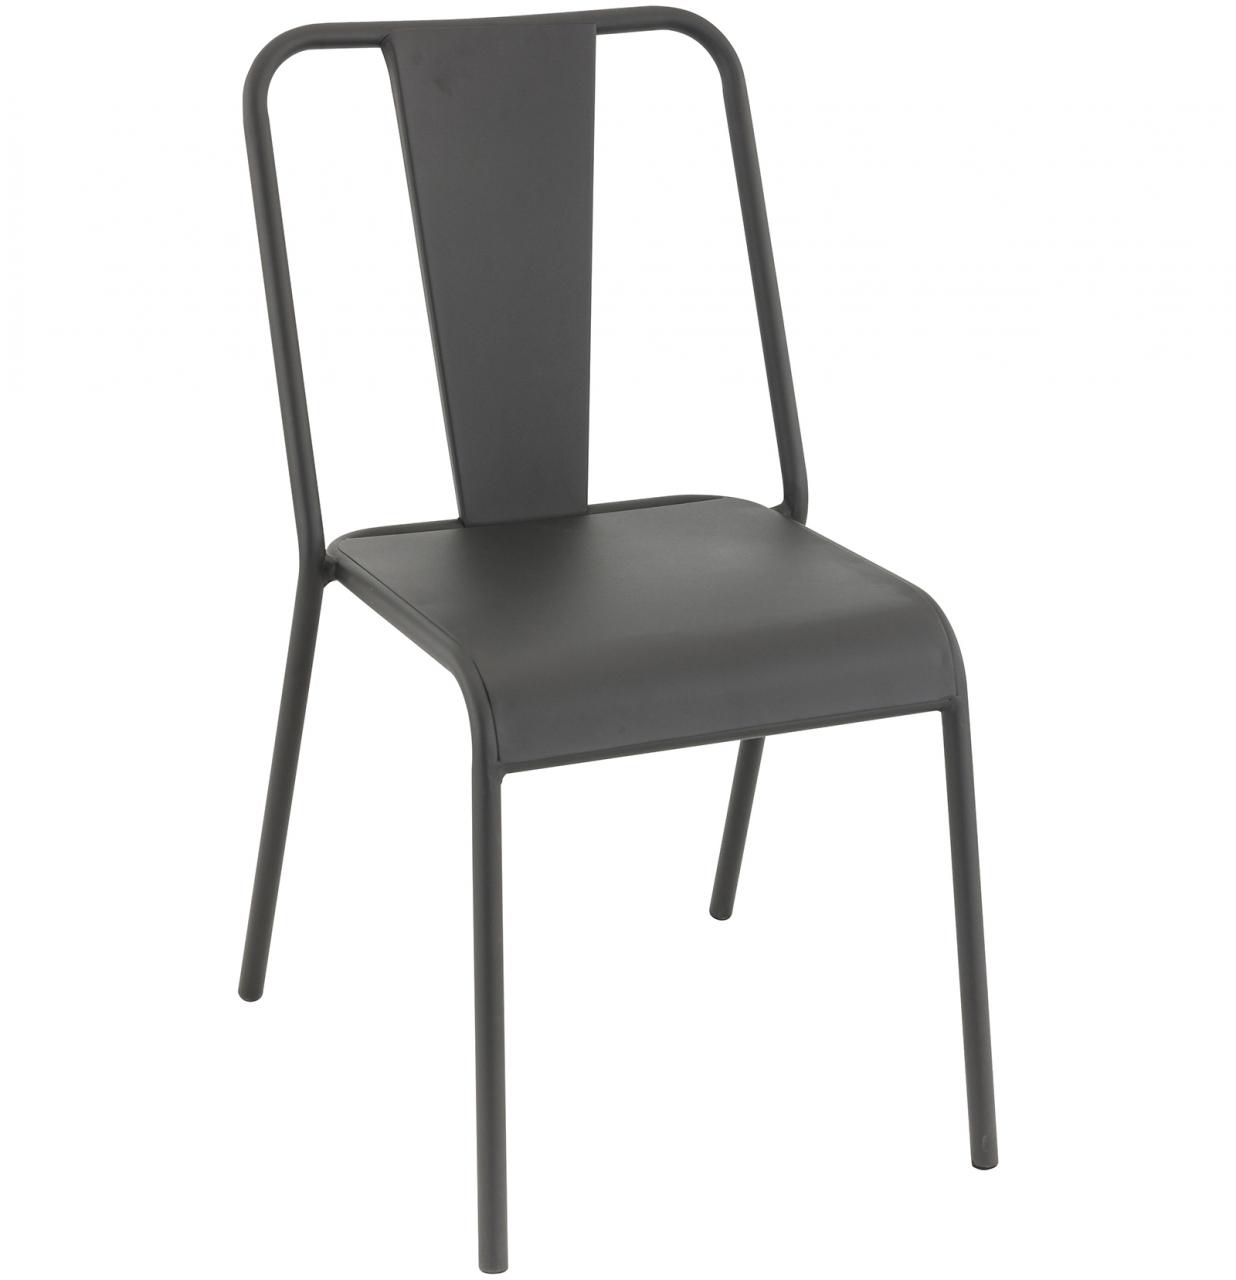 Mobilier coulomb chaise de terrasse m tal rivoli for Mobilier terrasse